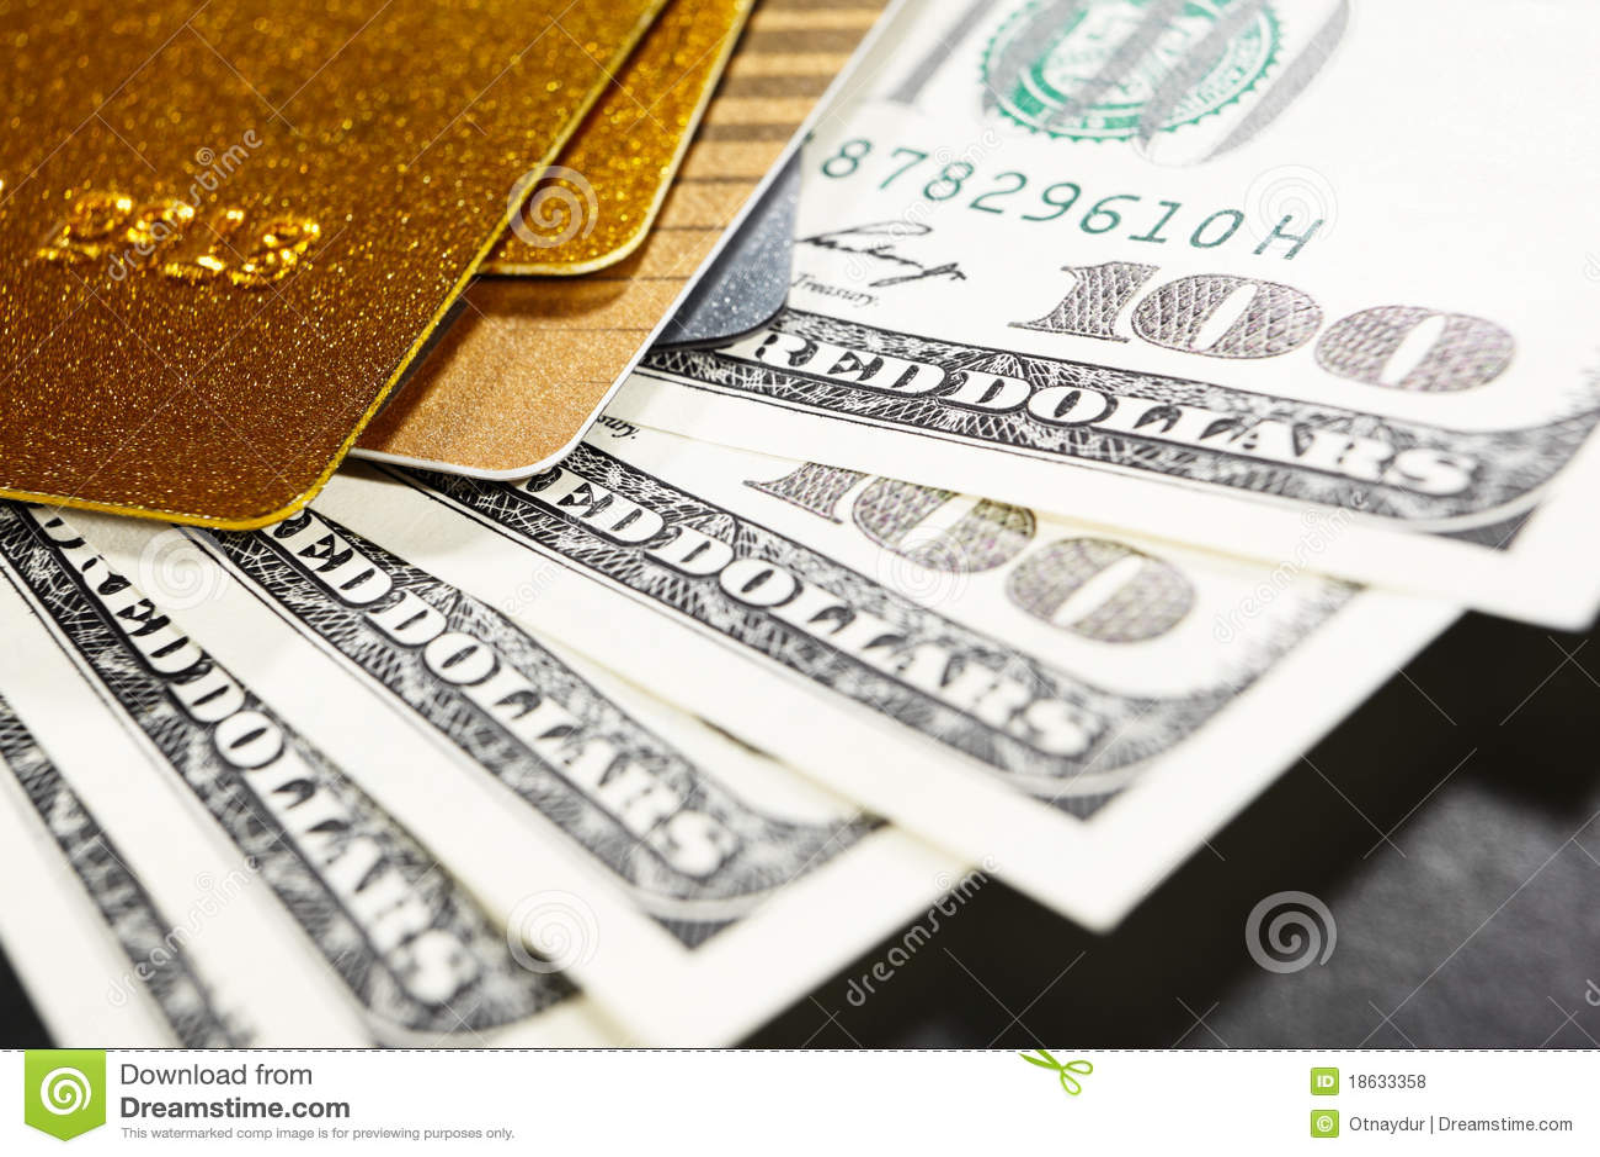 Money Kredit